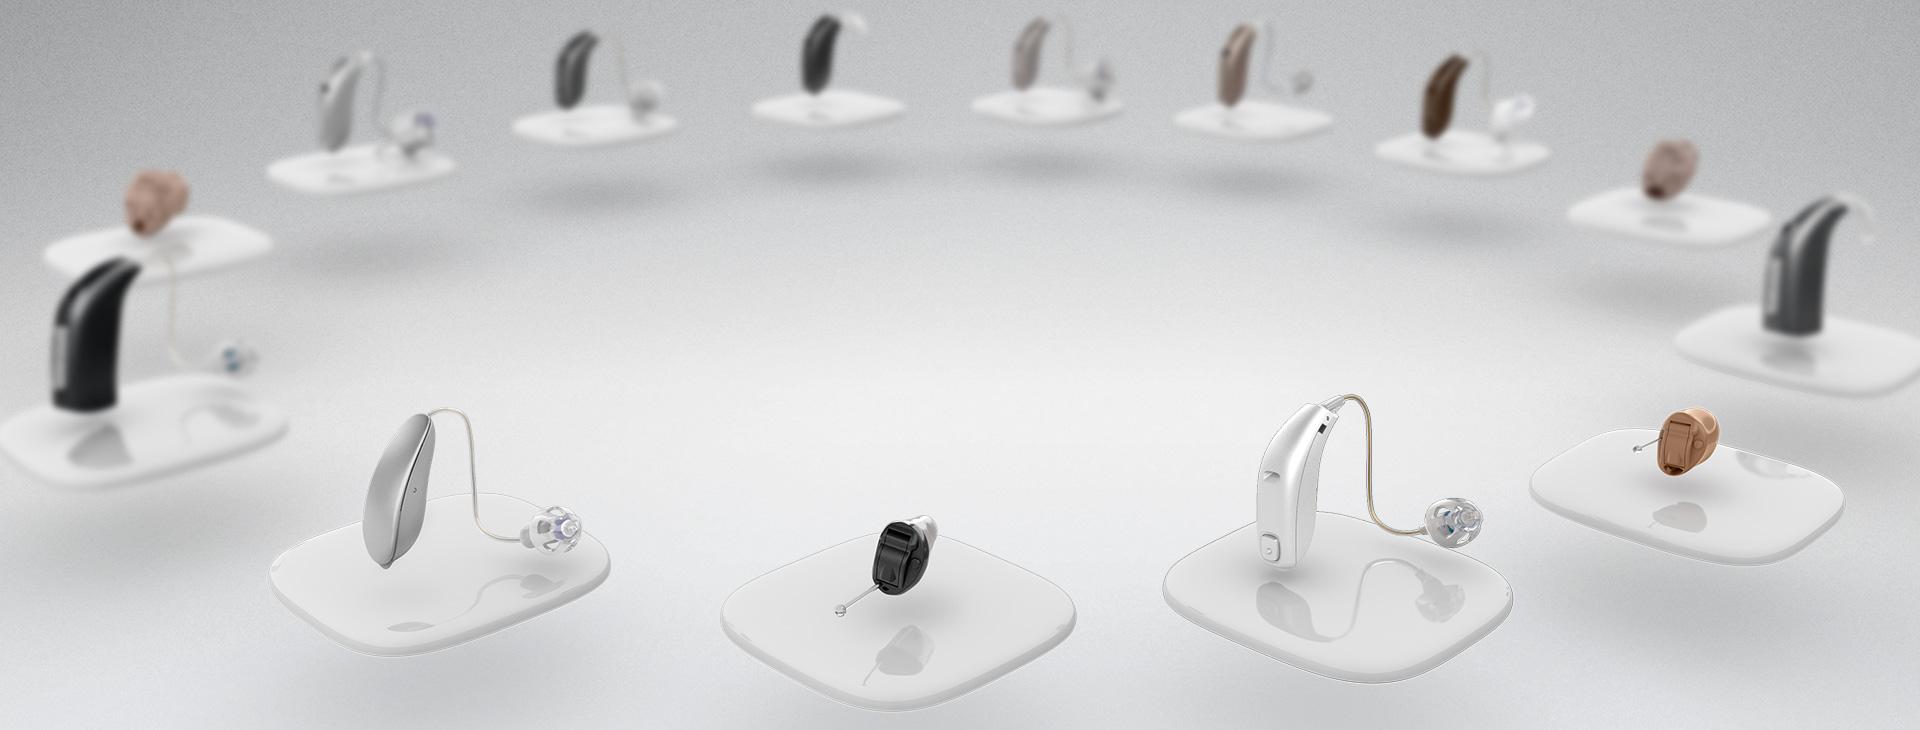 solutions-hearingaids